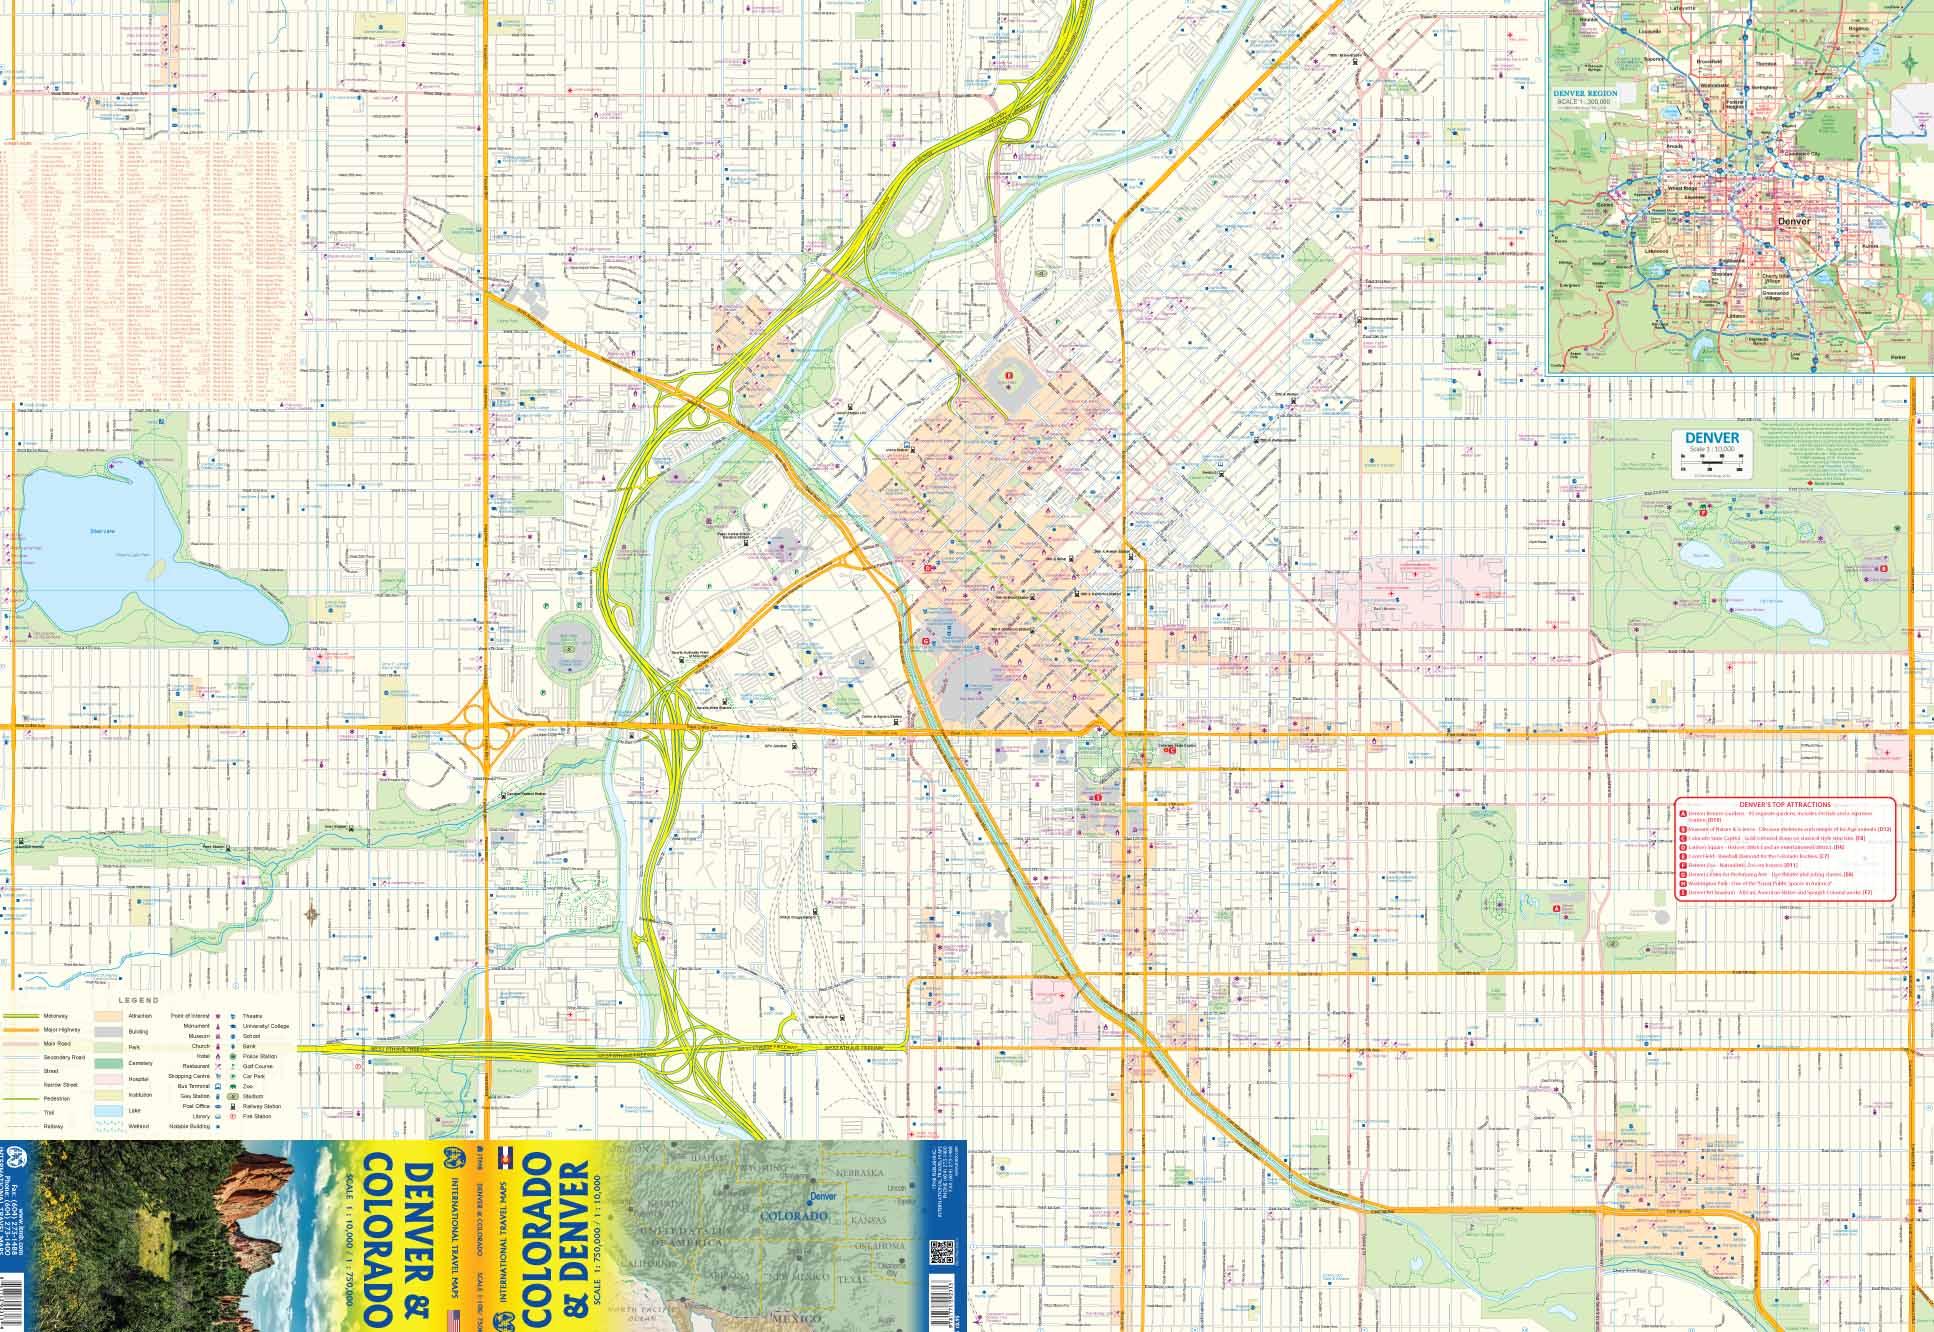 Denver, Colorado (US) road map at 1/10-1/75 000 - ITMB Publishing ...